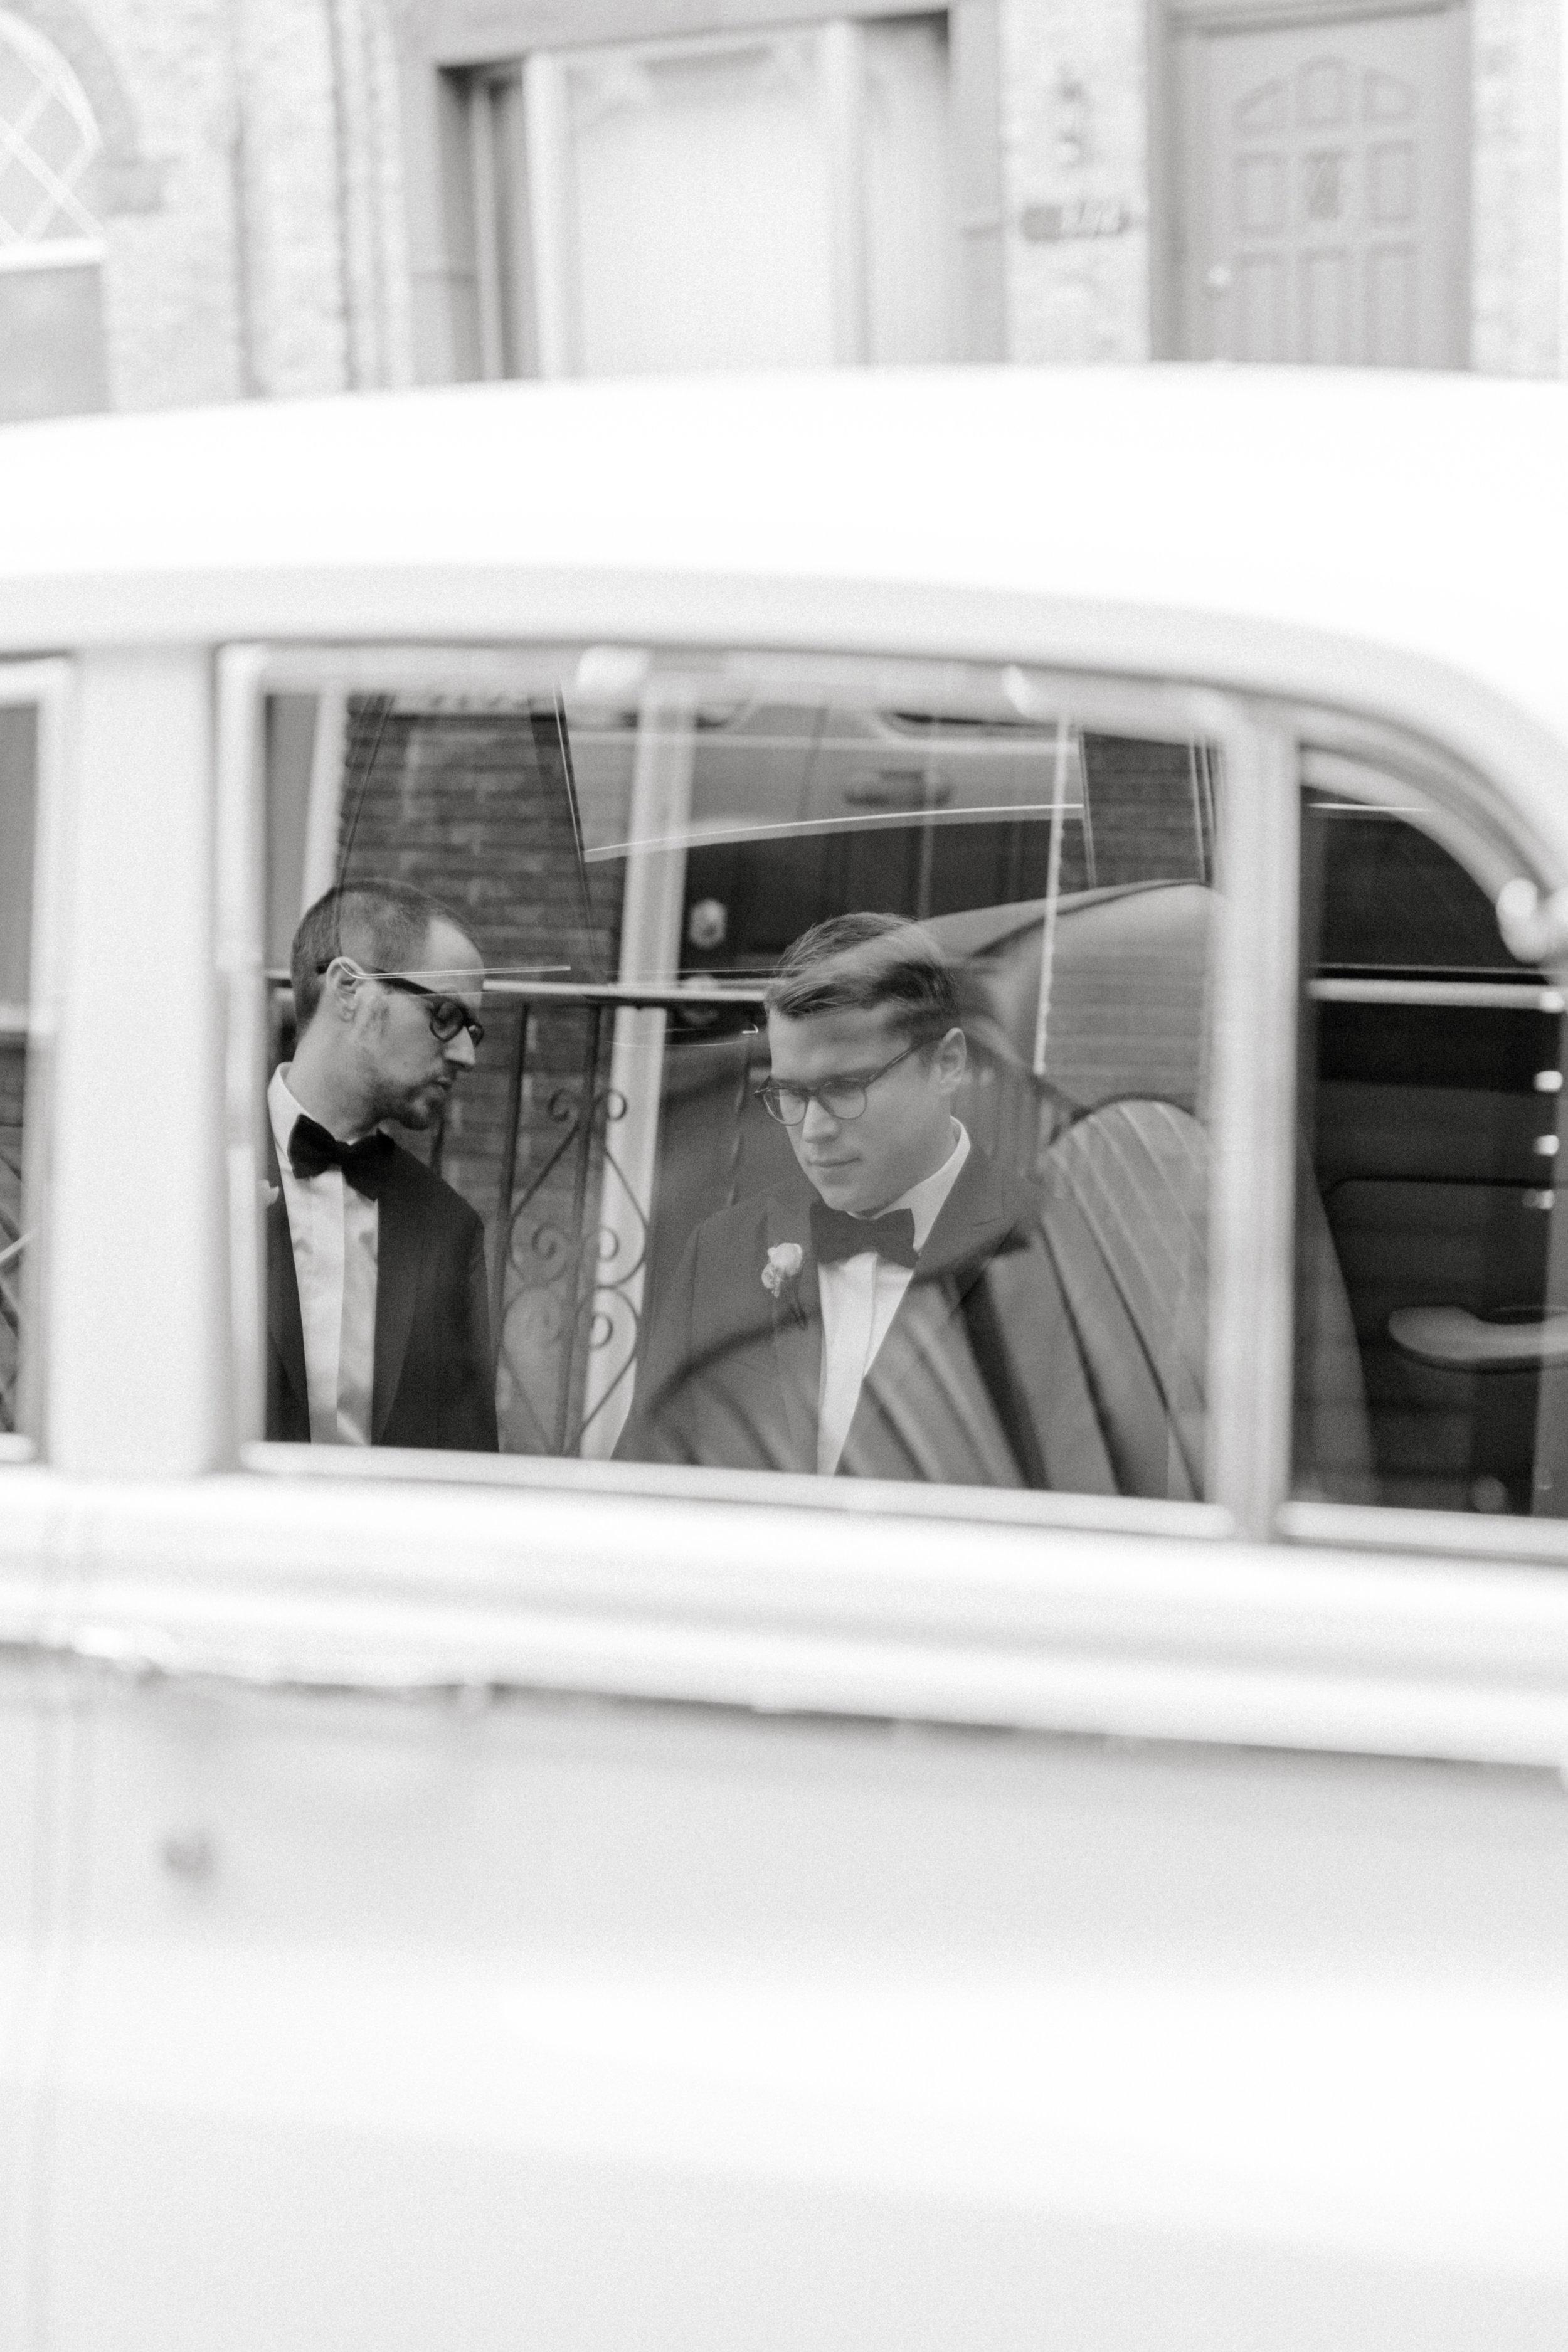 Rolls Royce on two grooms classic Philadelphia wedding day